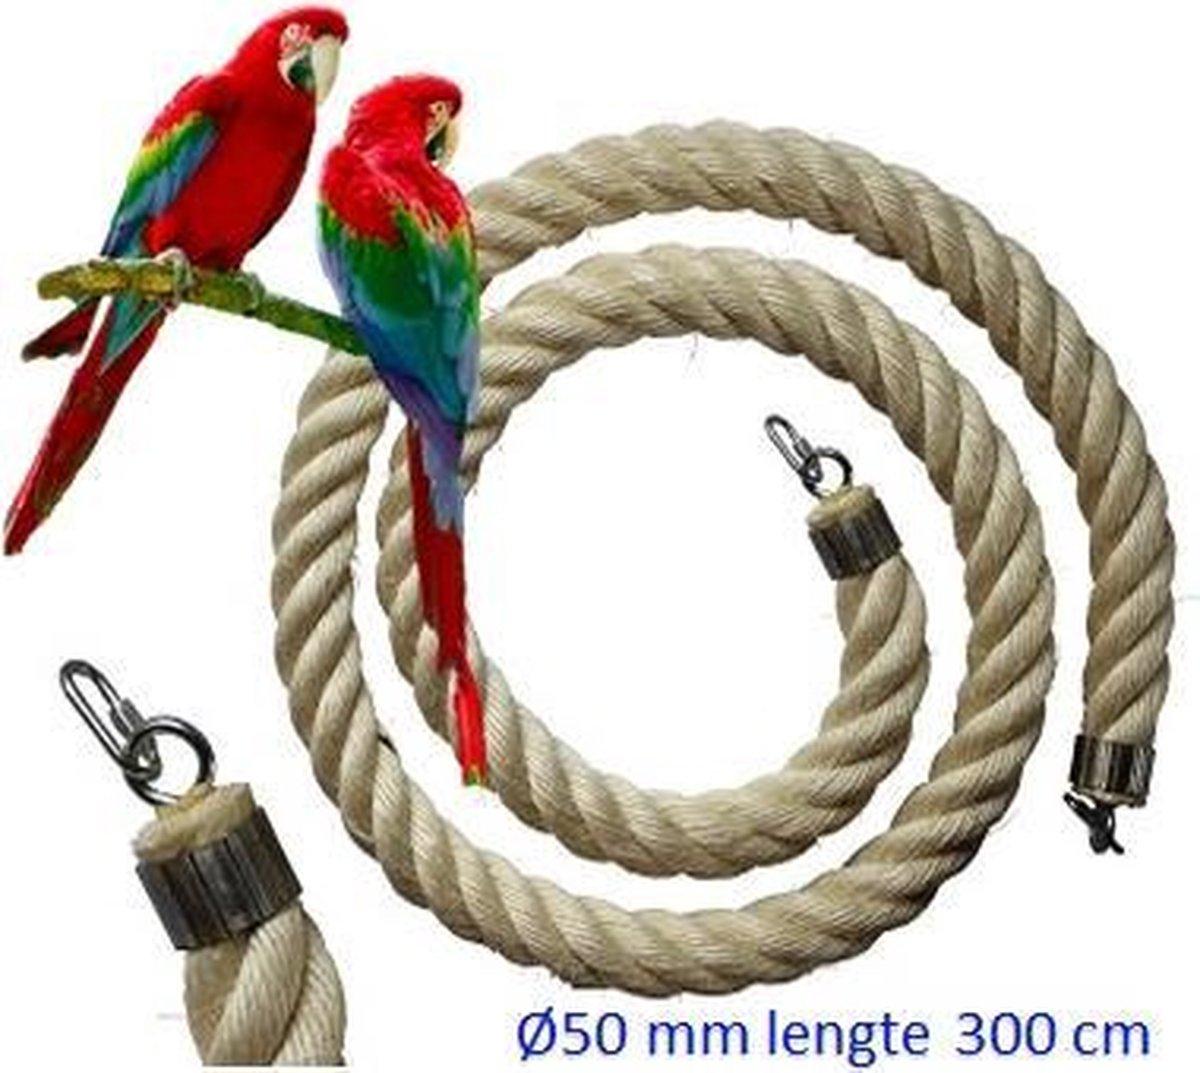 Jungle sisal touw  Ø 50 mm & 300cm lang (vogel touw ) - Jungle4birds